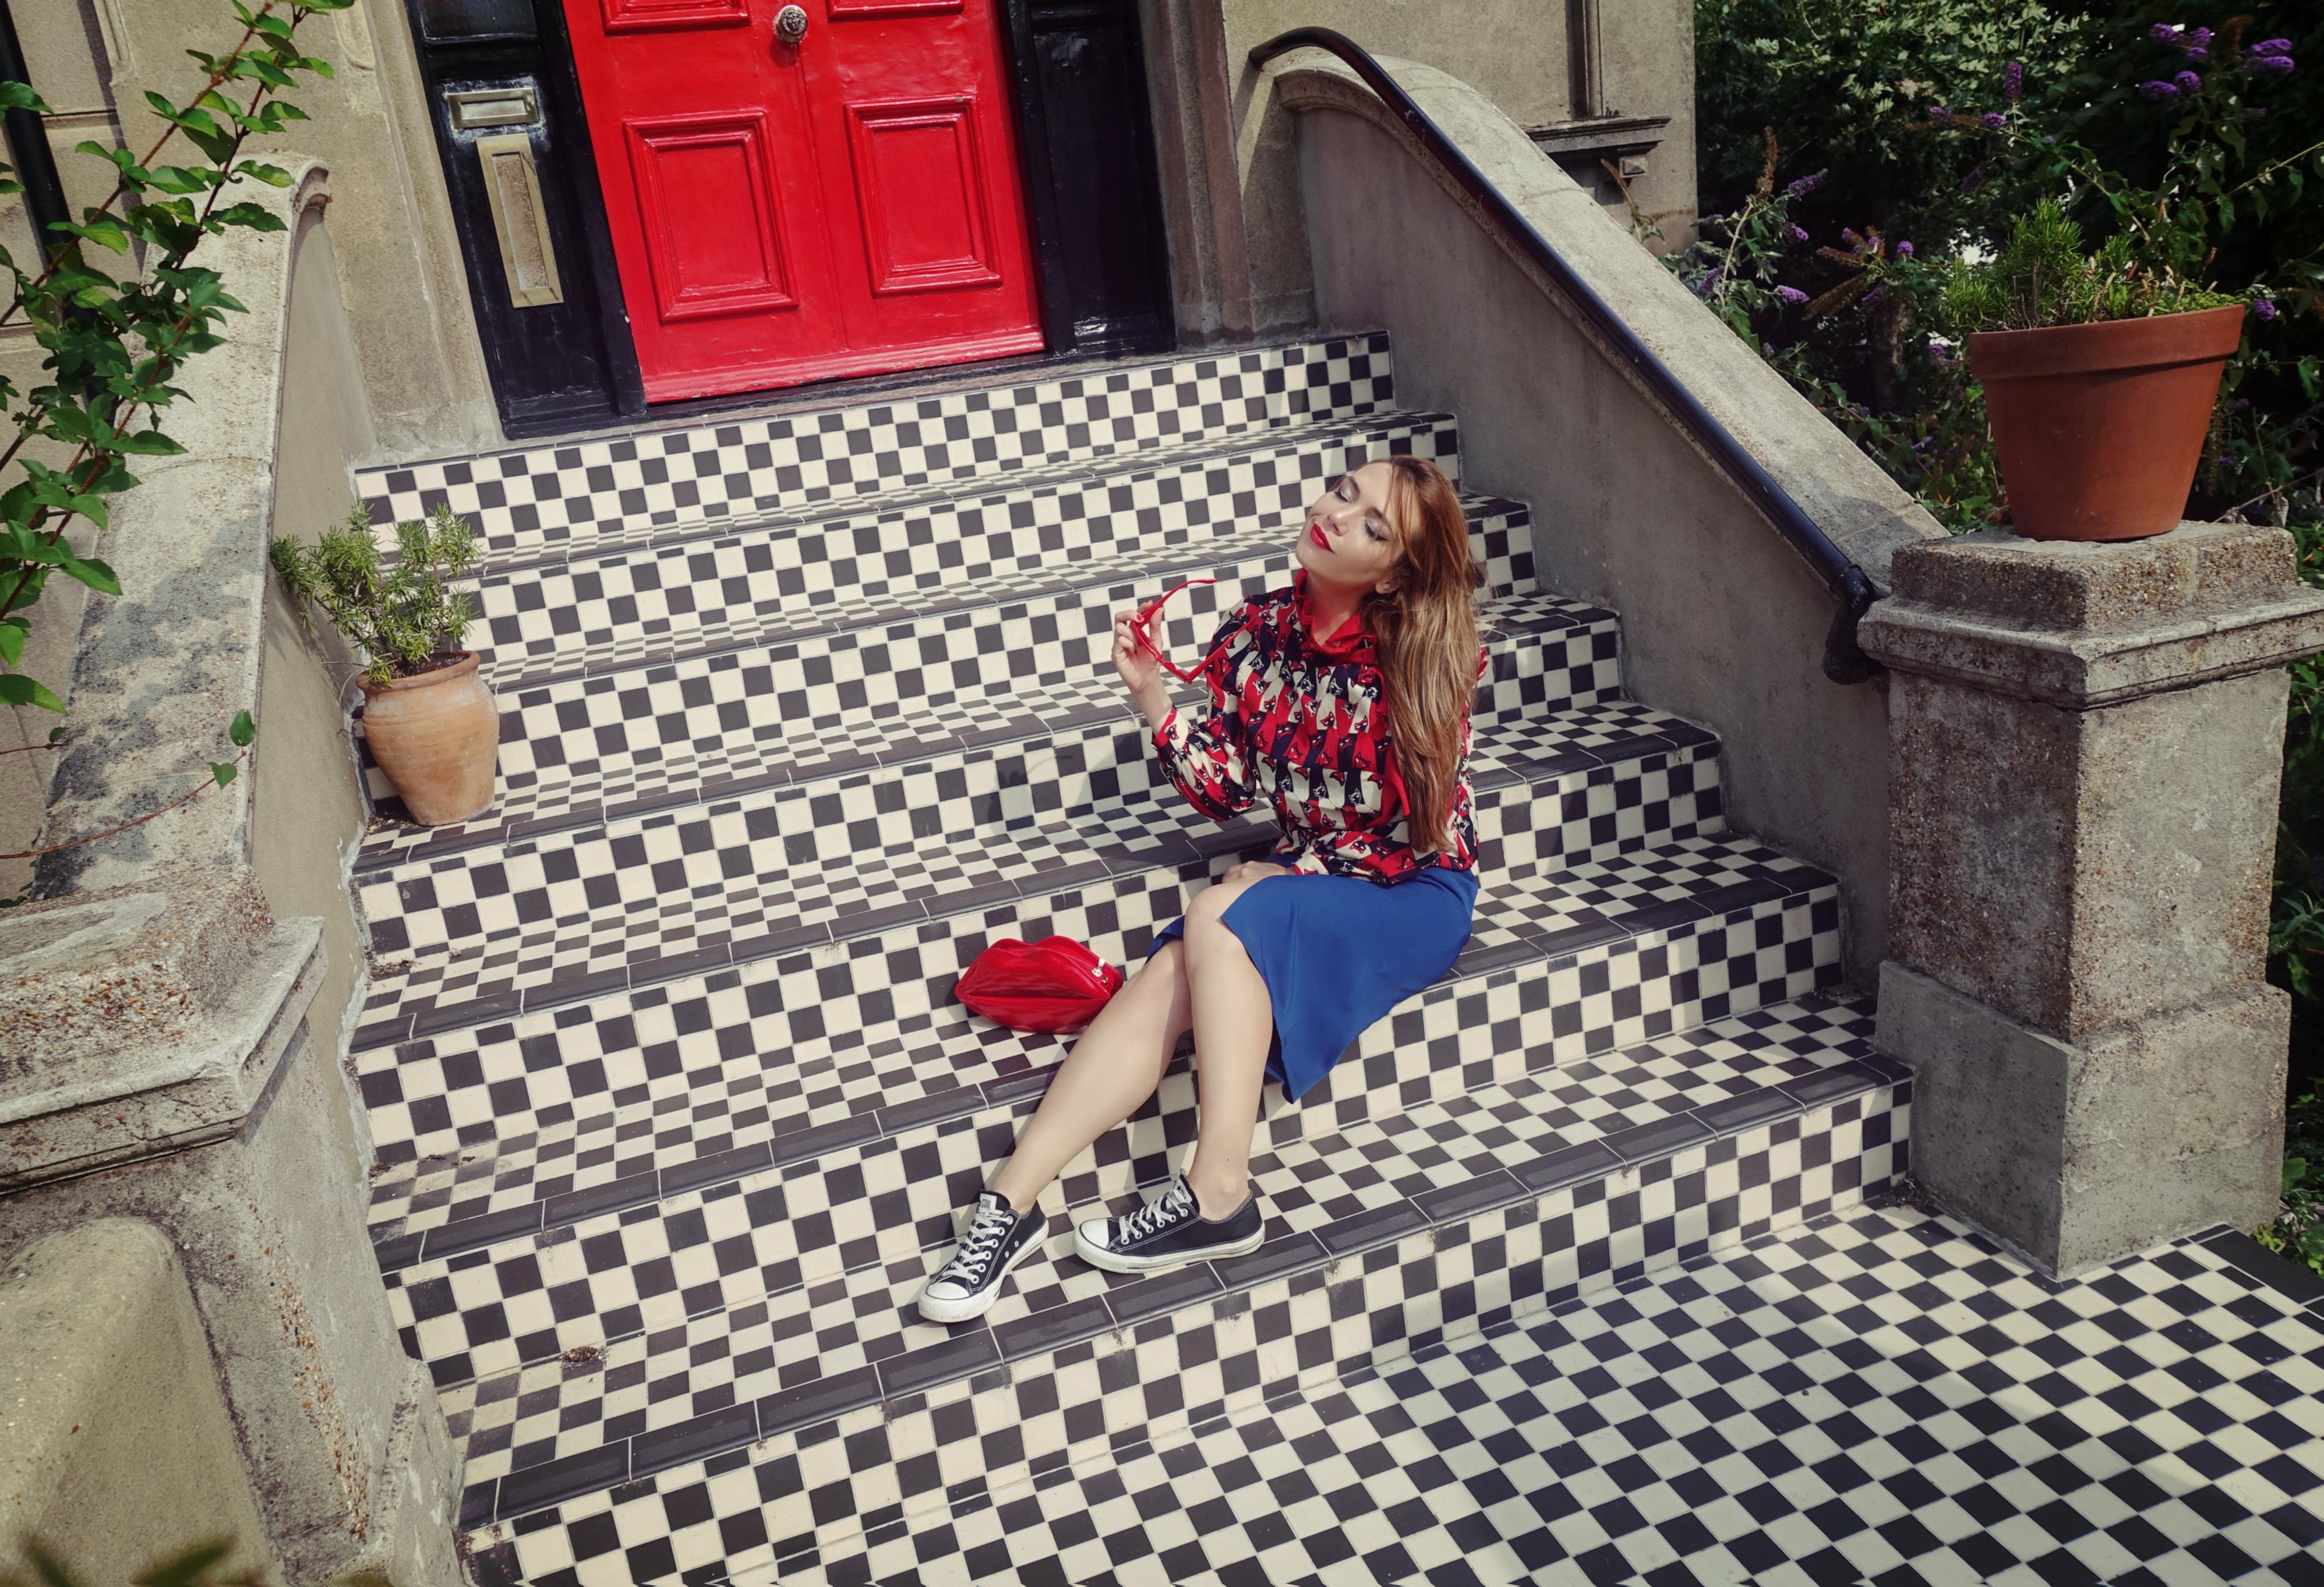 Look-retro-blog-de-moda-Chicadicta-fashion-brighton-PiensaenChic-influencer-faldas-tubo-minueto-converse-outfit-Chic-adicta-Piensa-en-Chic